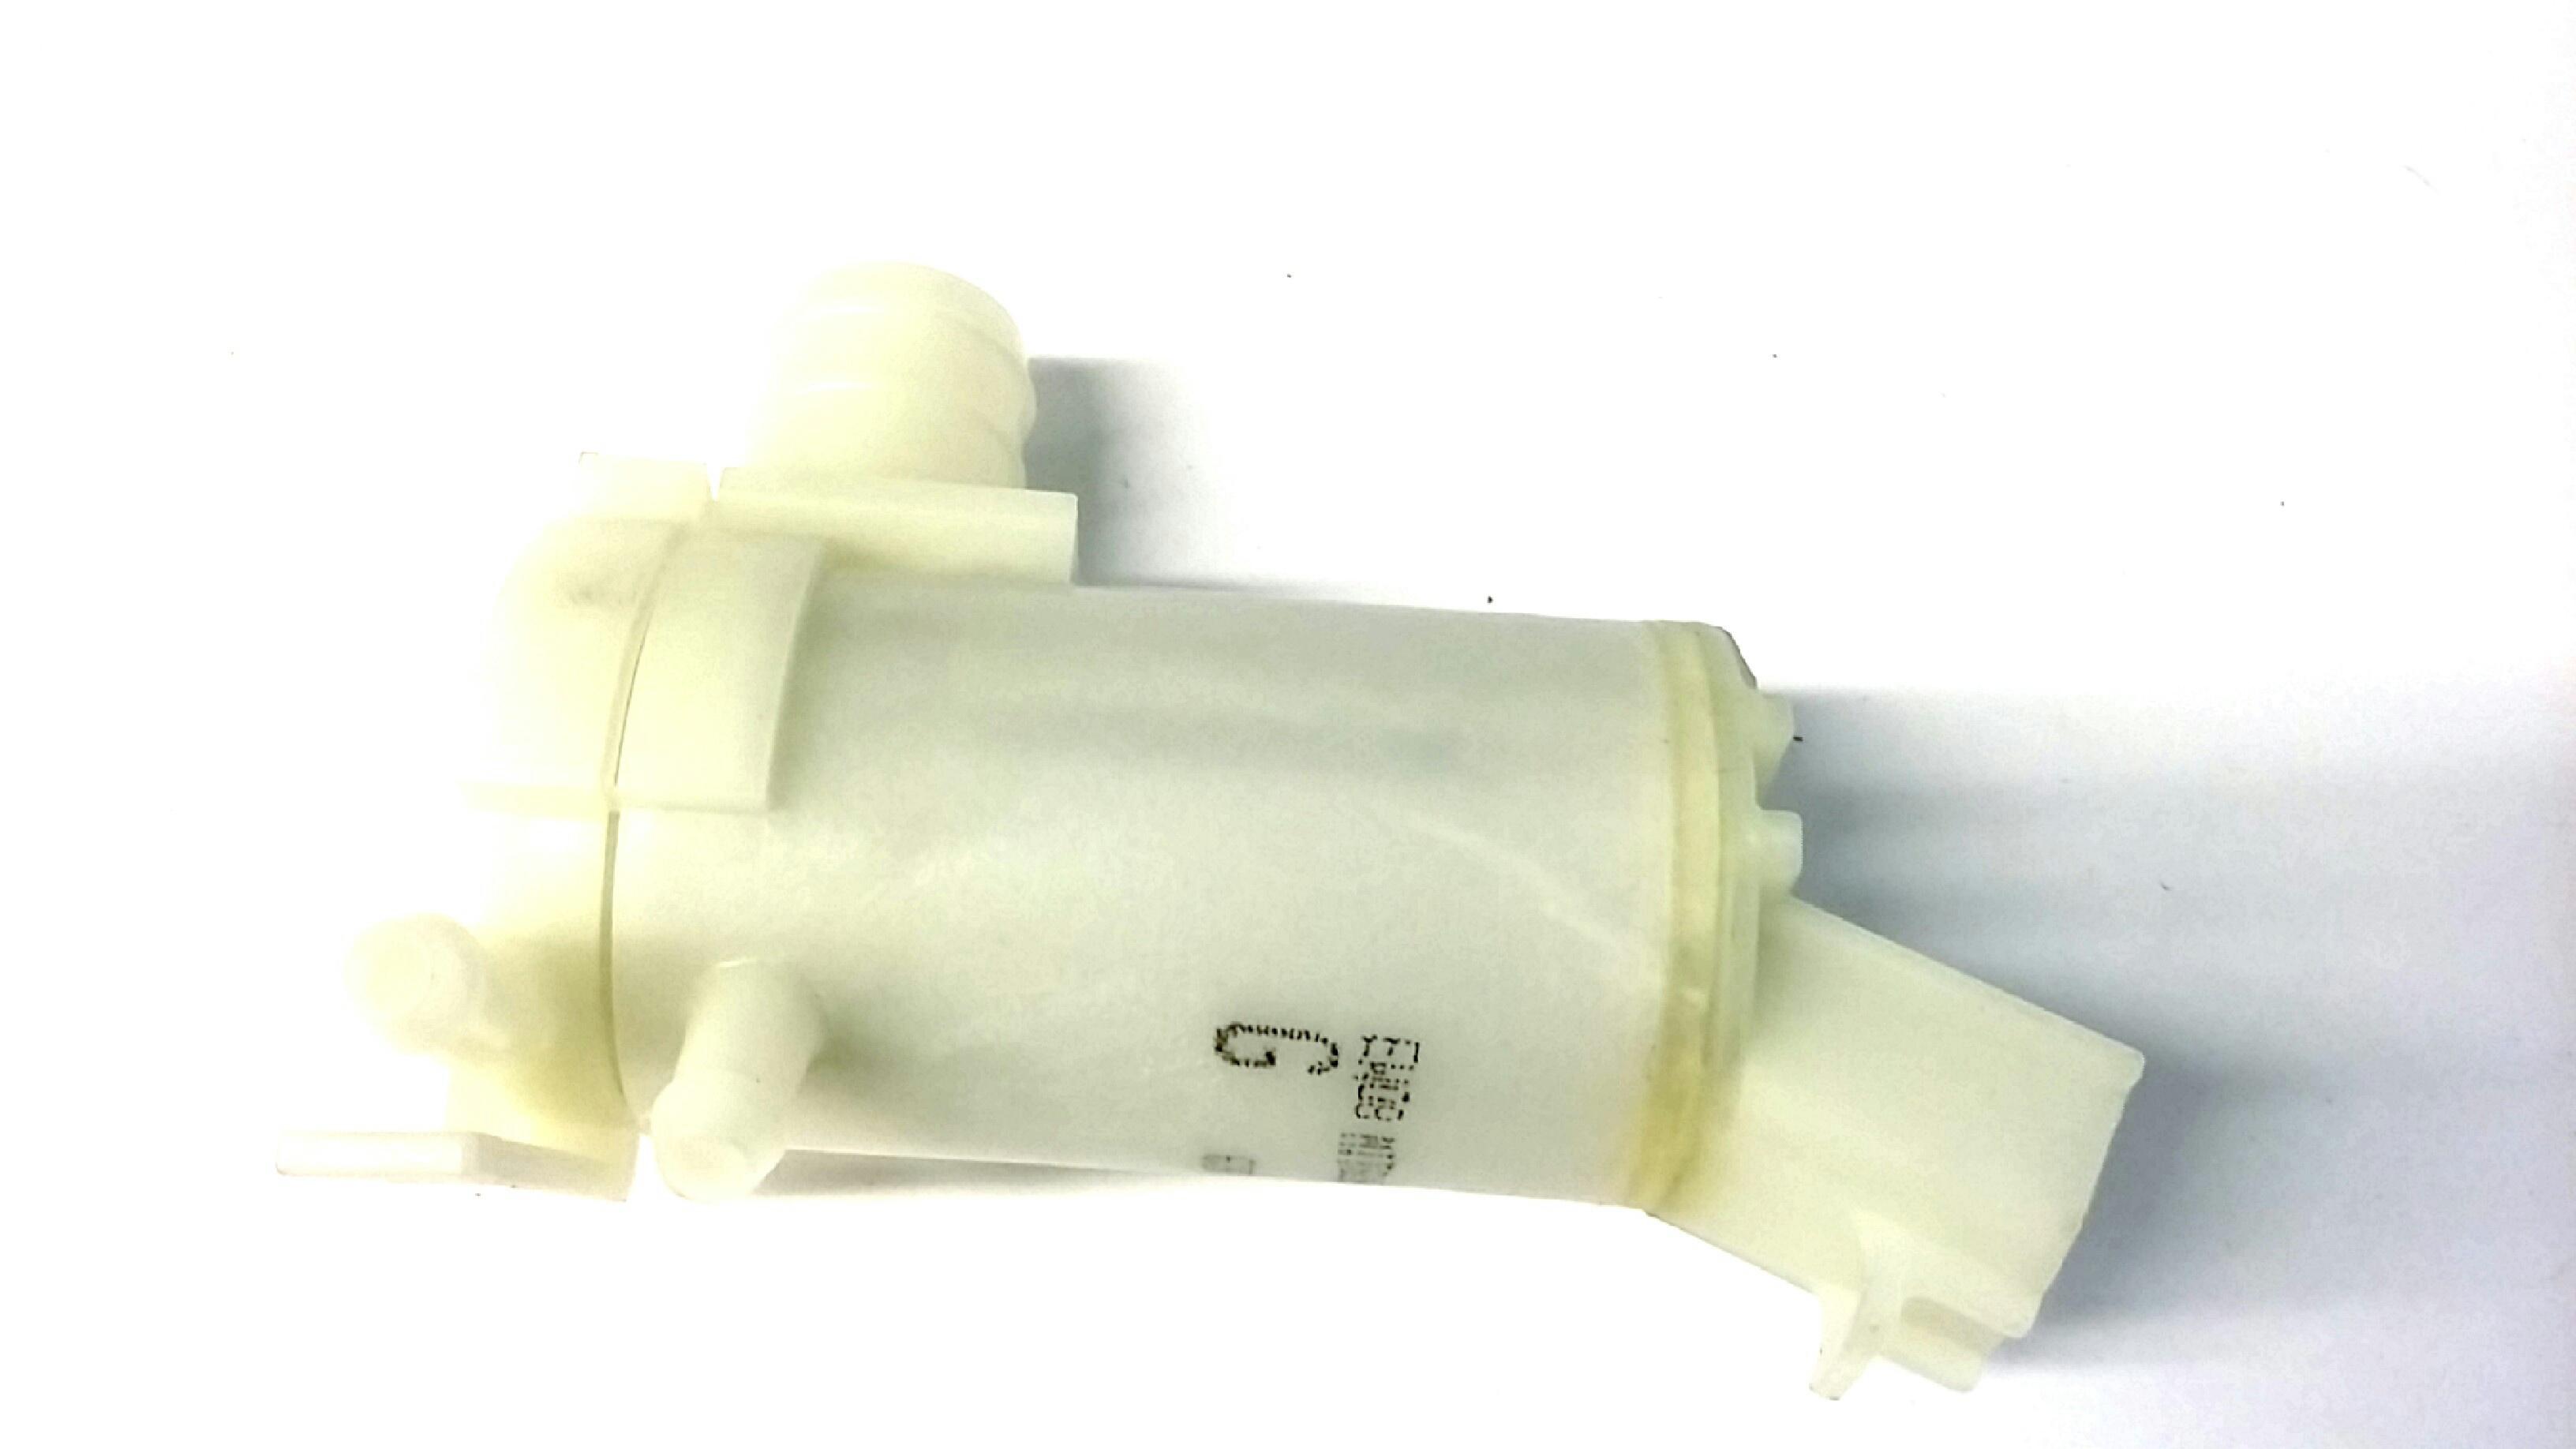 2015 subaru impreza motor pump assembly washer for Motor city auto glass